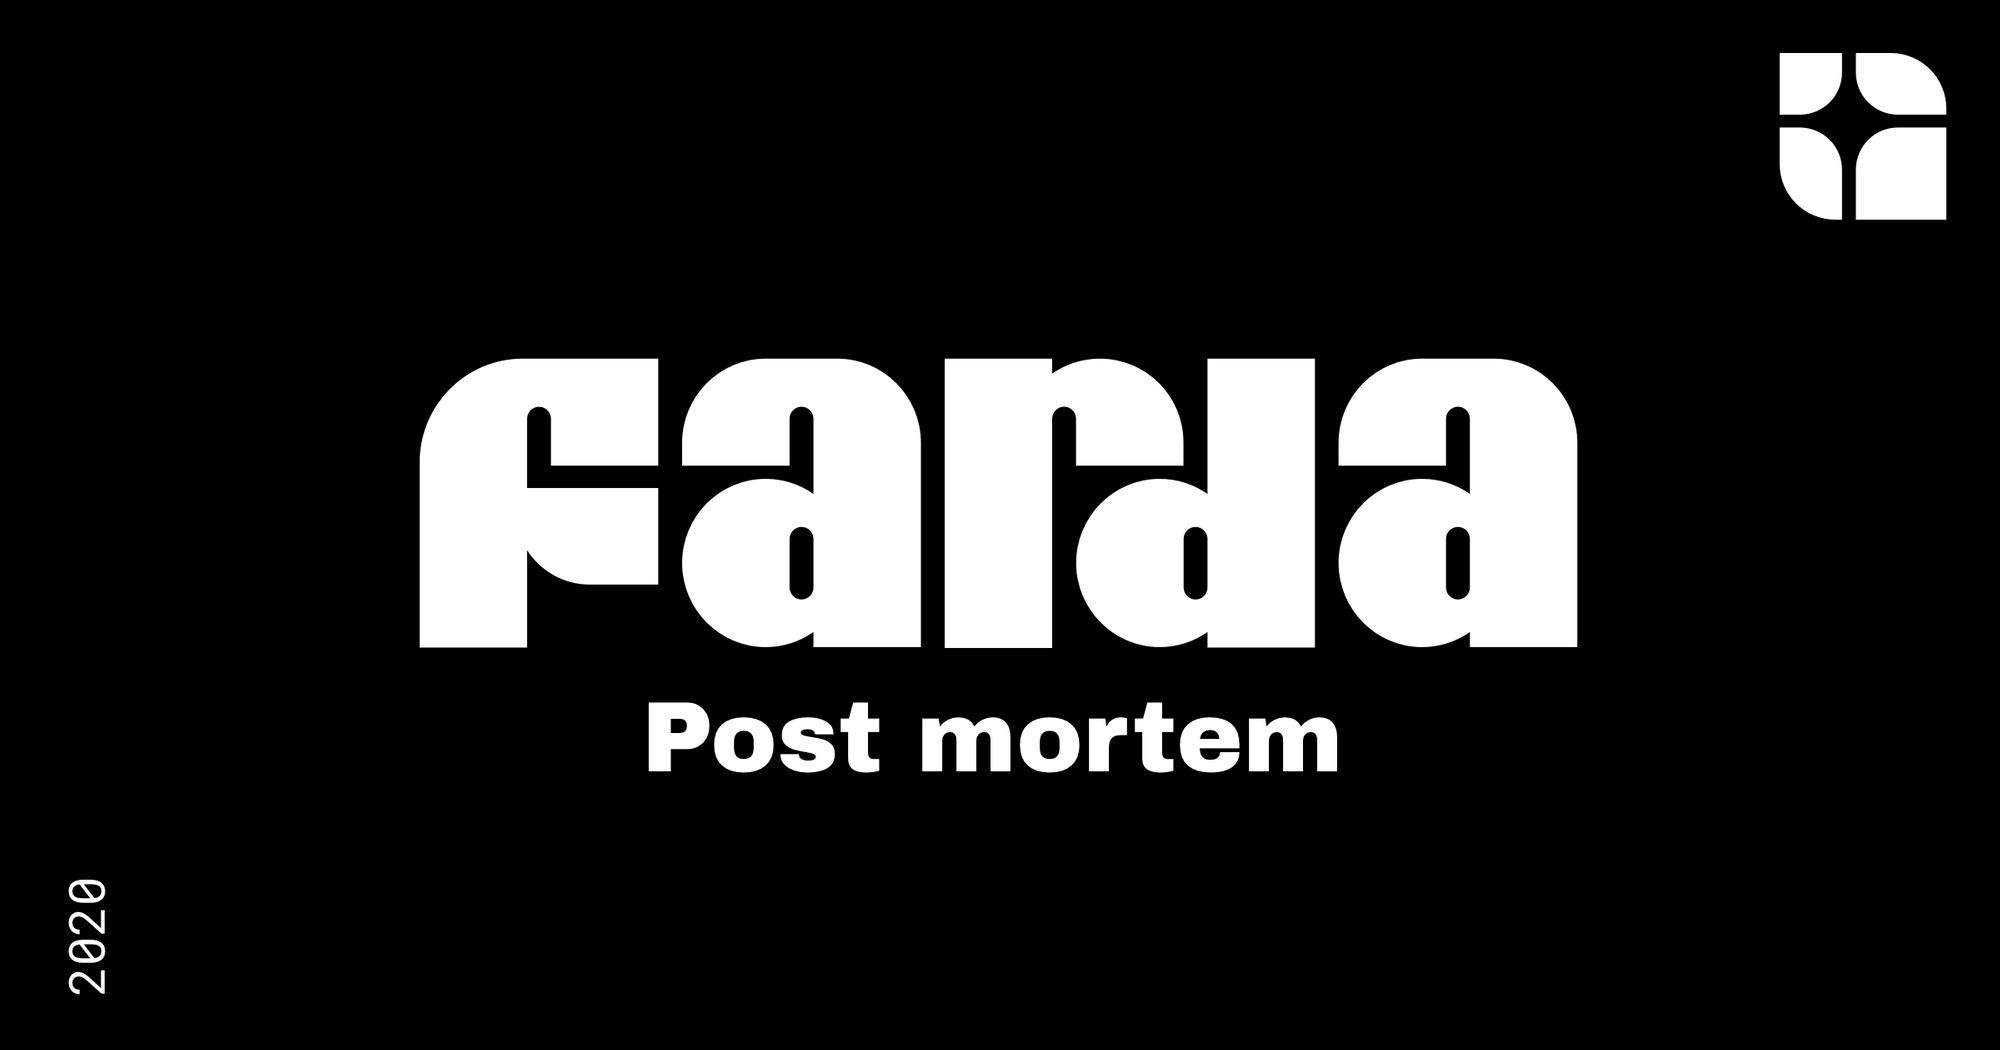 Farda: Post Mortem [en]